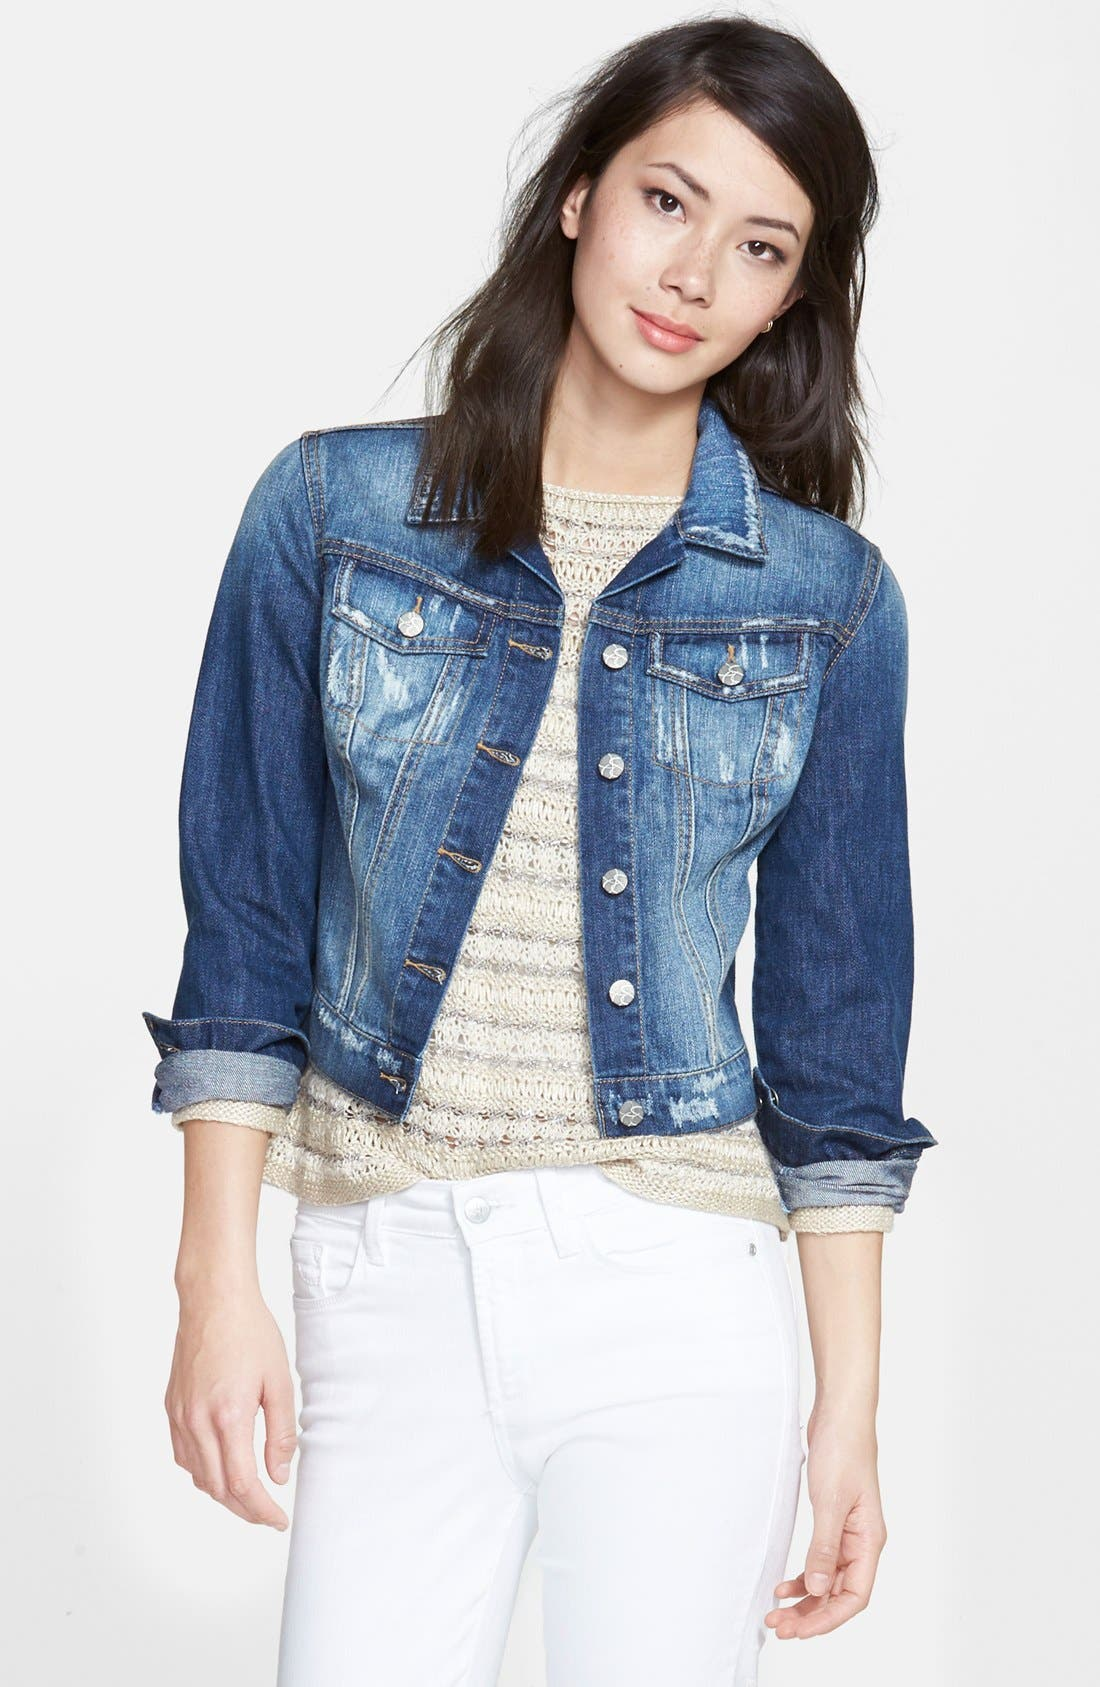 Alternate Image 1 Selected - Jessica Simpson 'Pixie' Denim Jacket